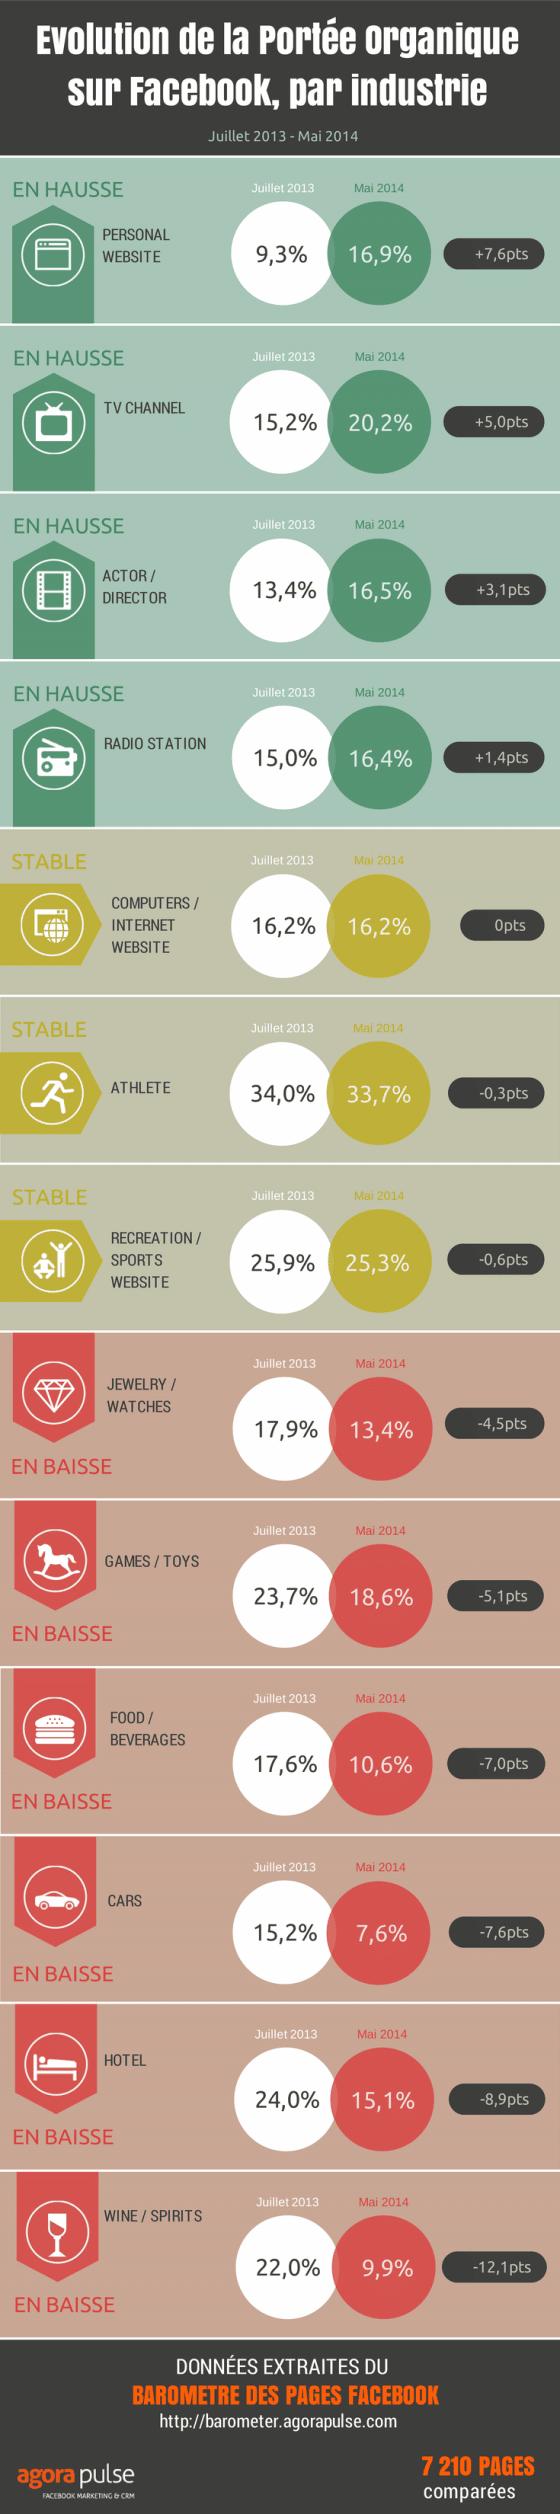 portee-organique-facebook-infographie-Mai-2014